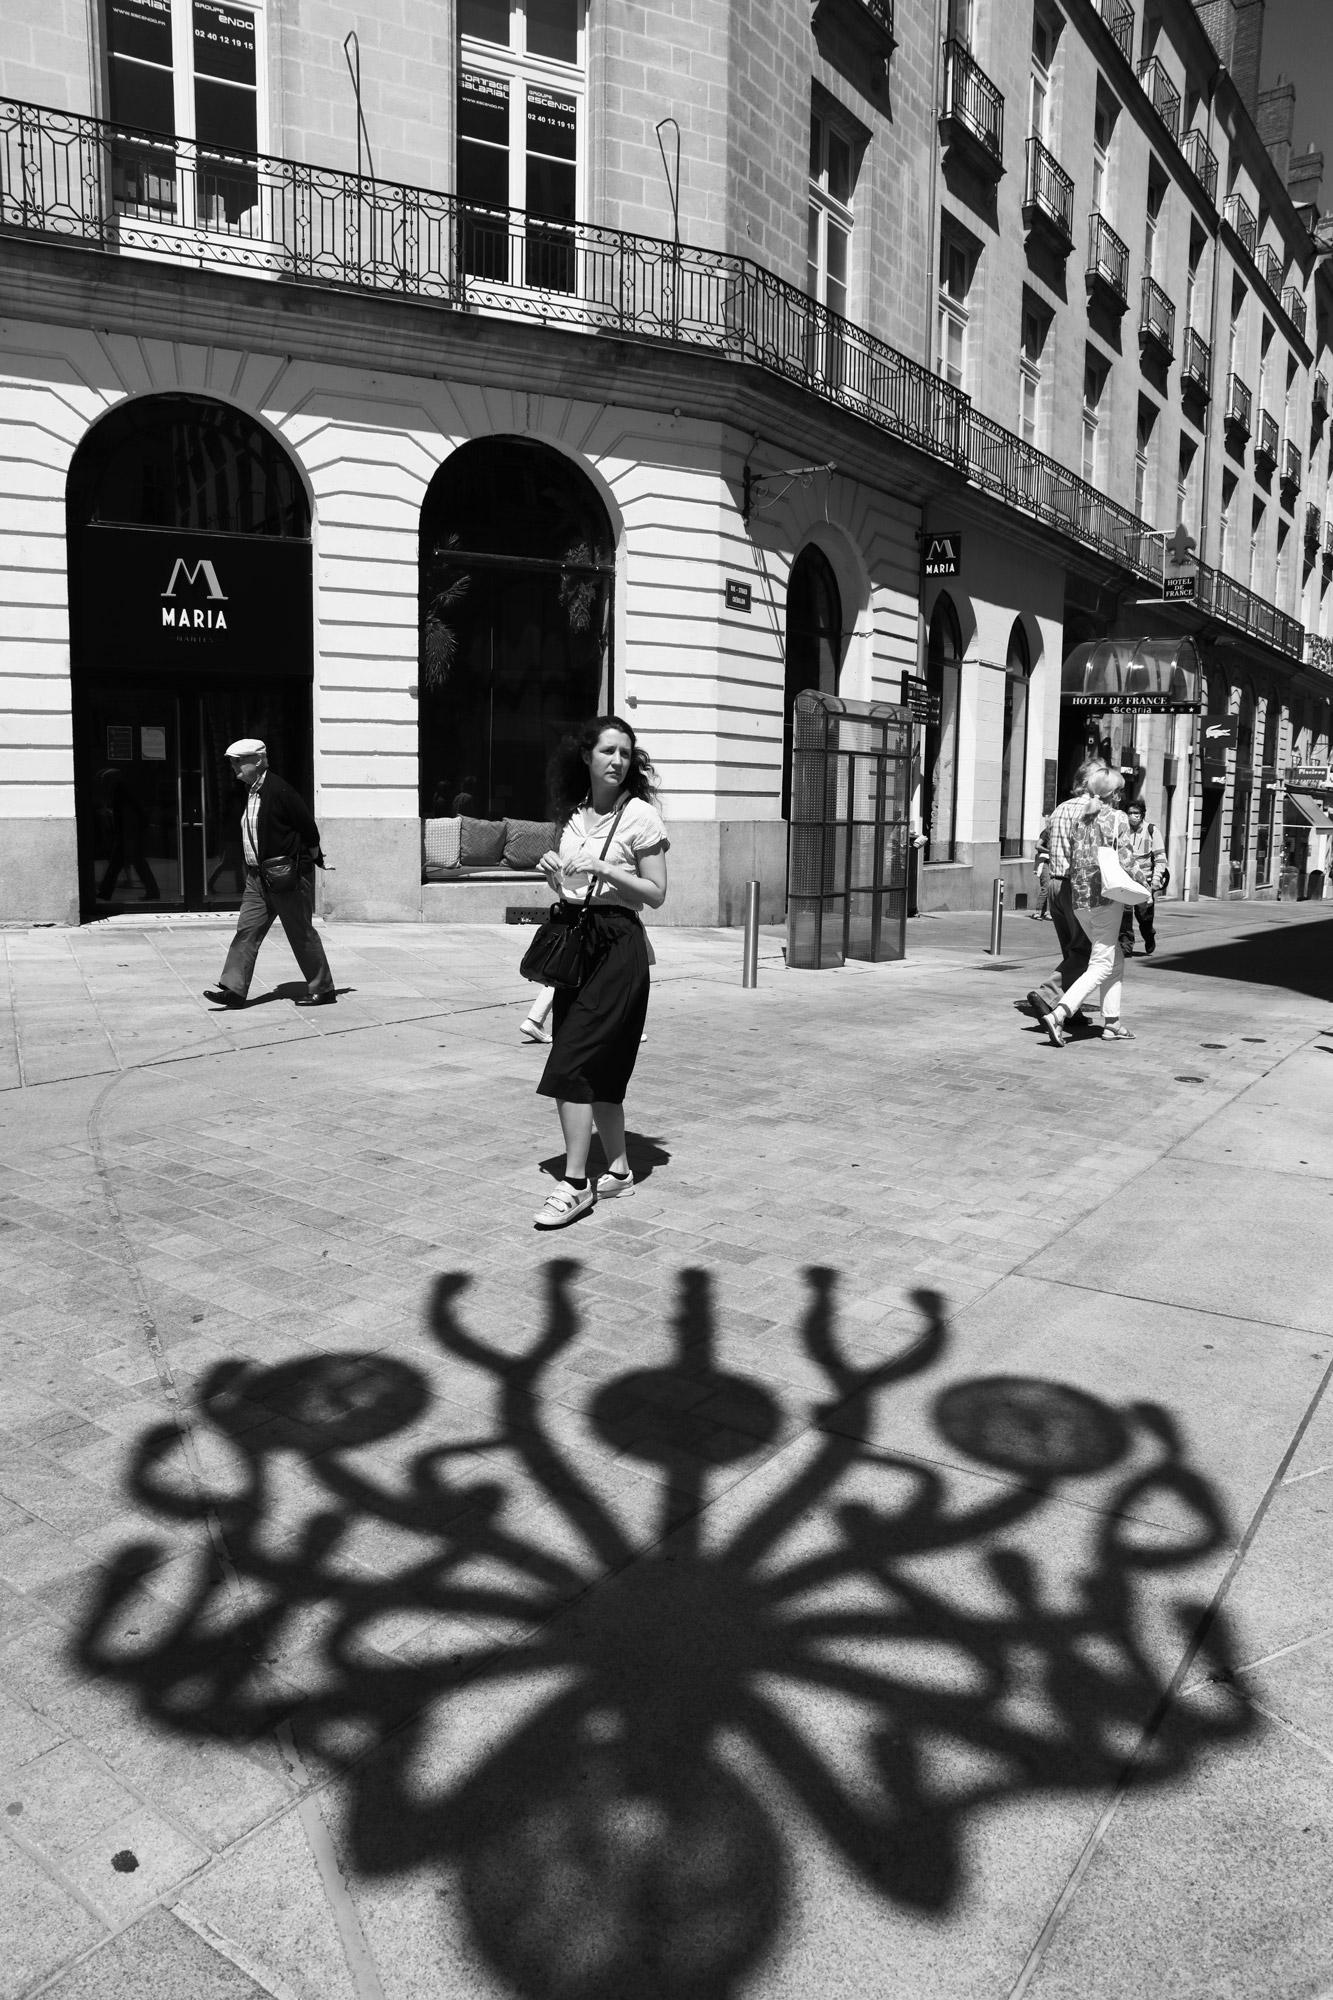 """The spider light"" - Place Graslin, Nantes. ©Clémence Rougetet"